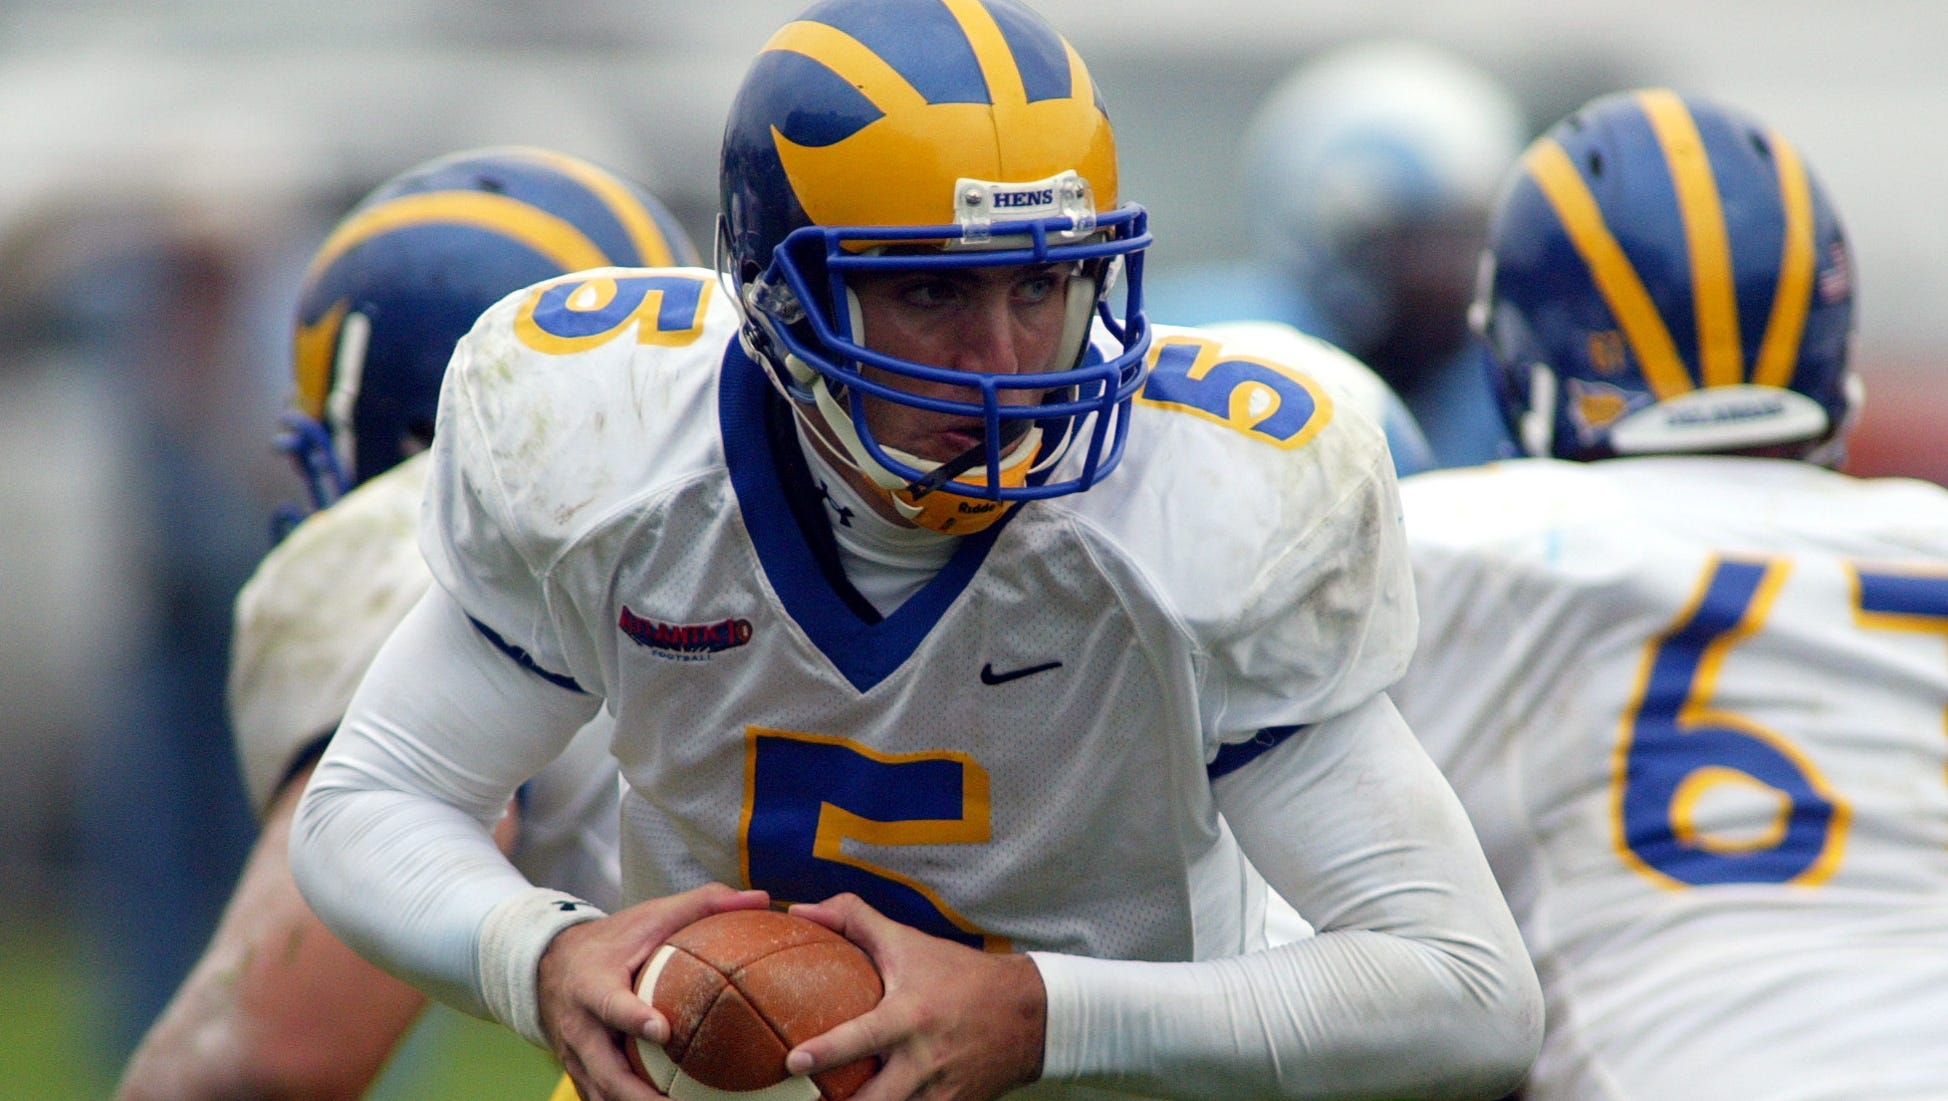 University of Delaware alums galvanized by Joe Flacco's Super Bowl ...